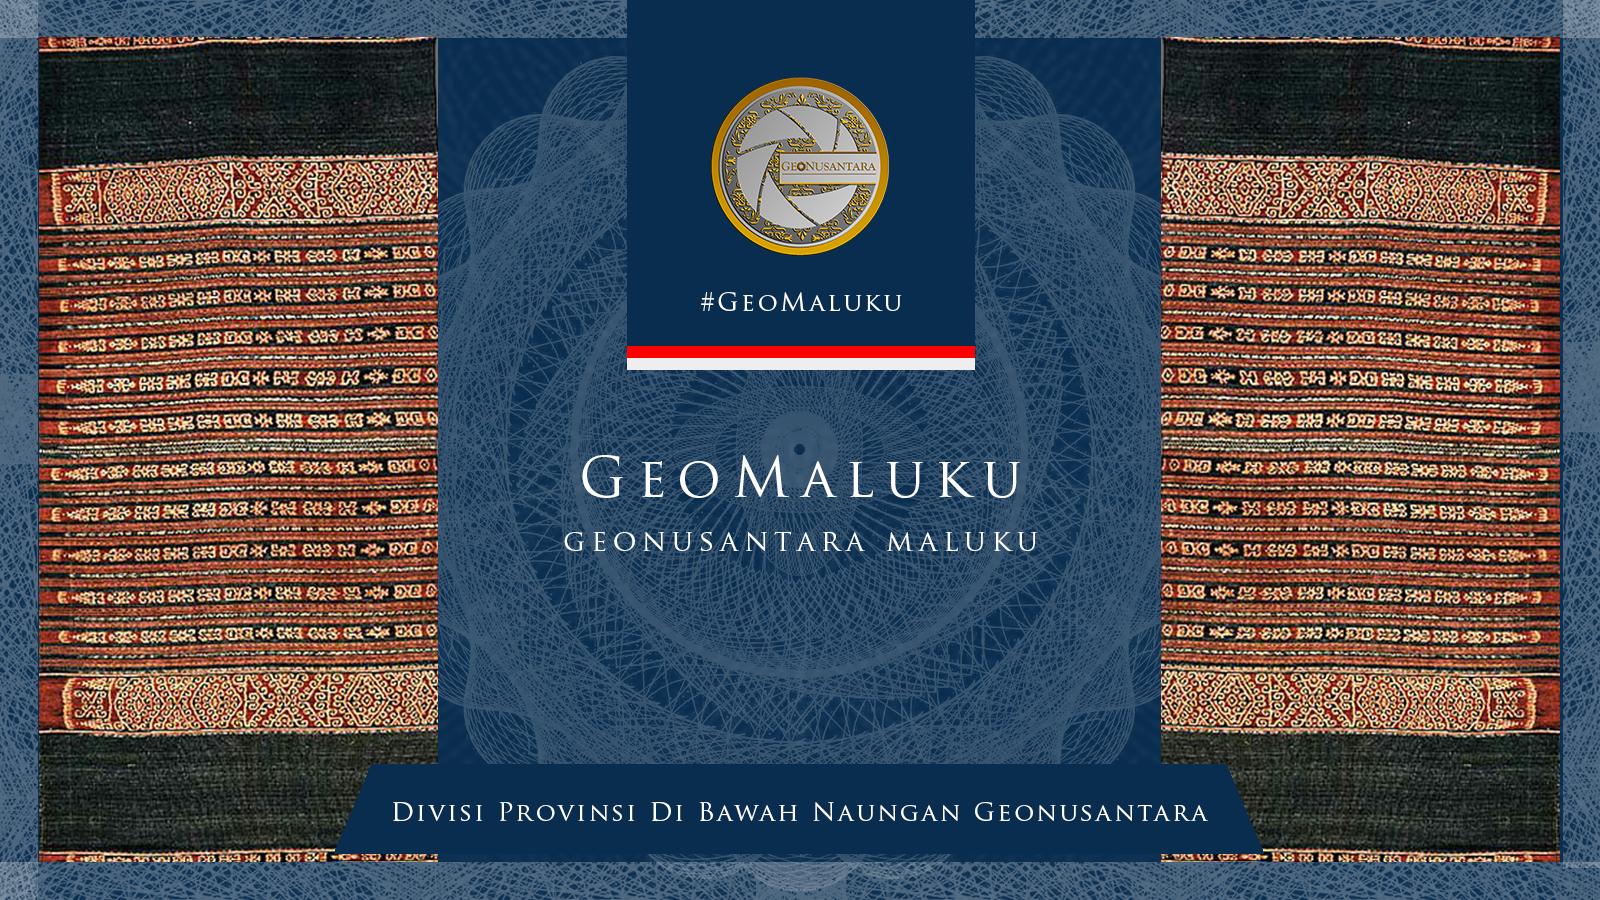 Launching Geonusantara Maluku